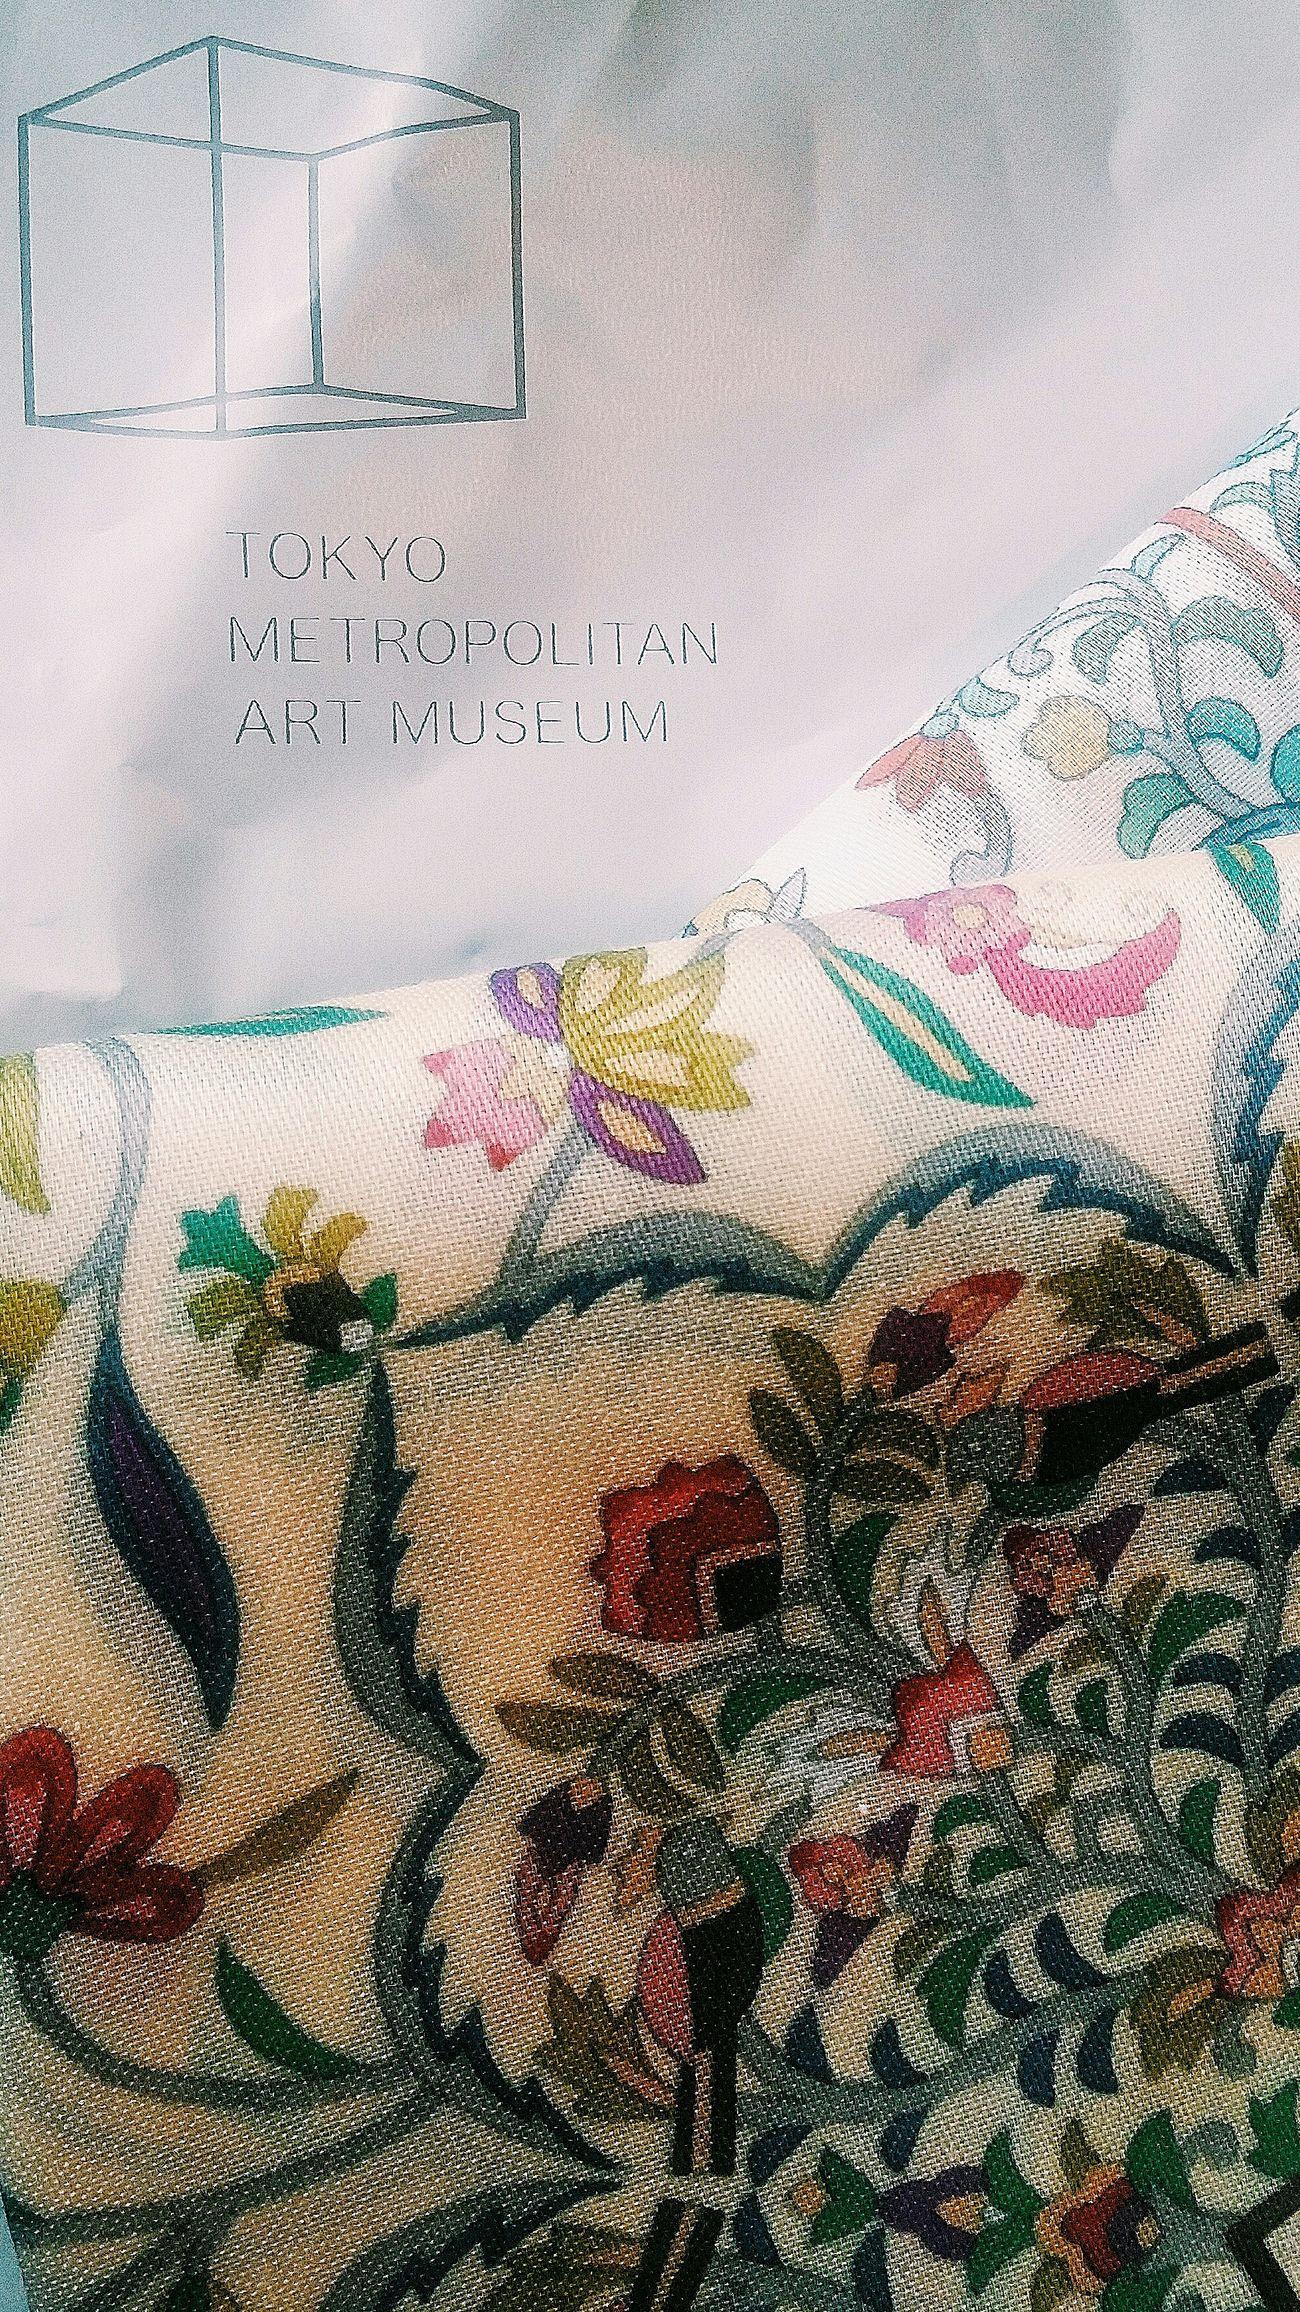 Hanky Handkerchief Tokyometropolitanartmeseum Gift Shop Souvenir from my sister Design Ueno Park Tokyouenospring2016 Tokyospring2016 EyeEM Tokyo EyeEm Gallery